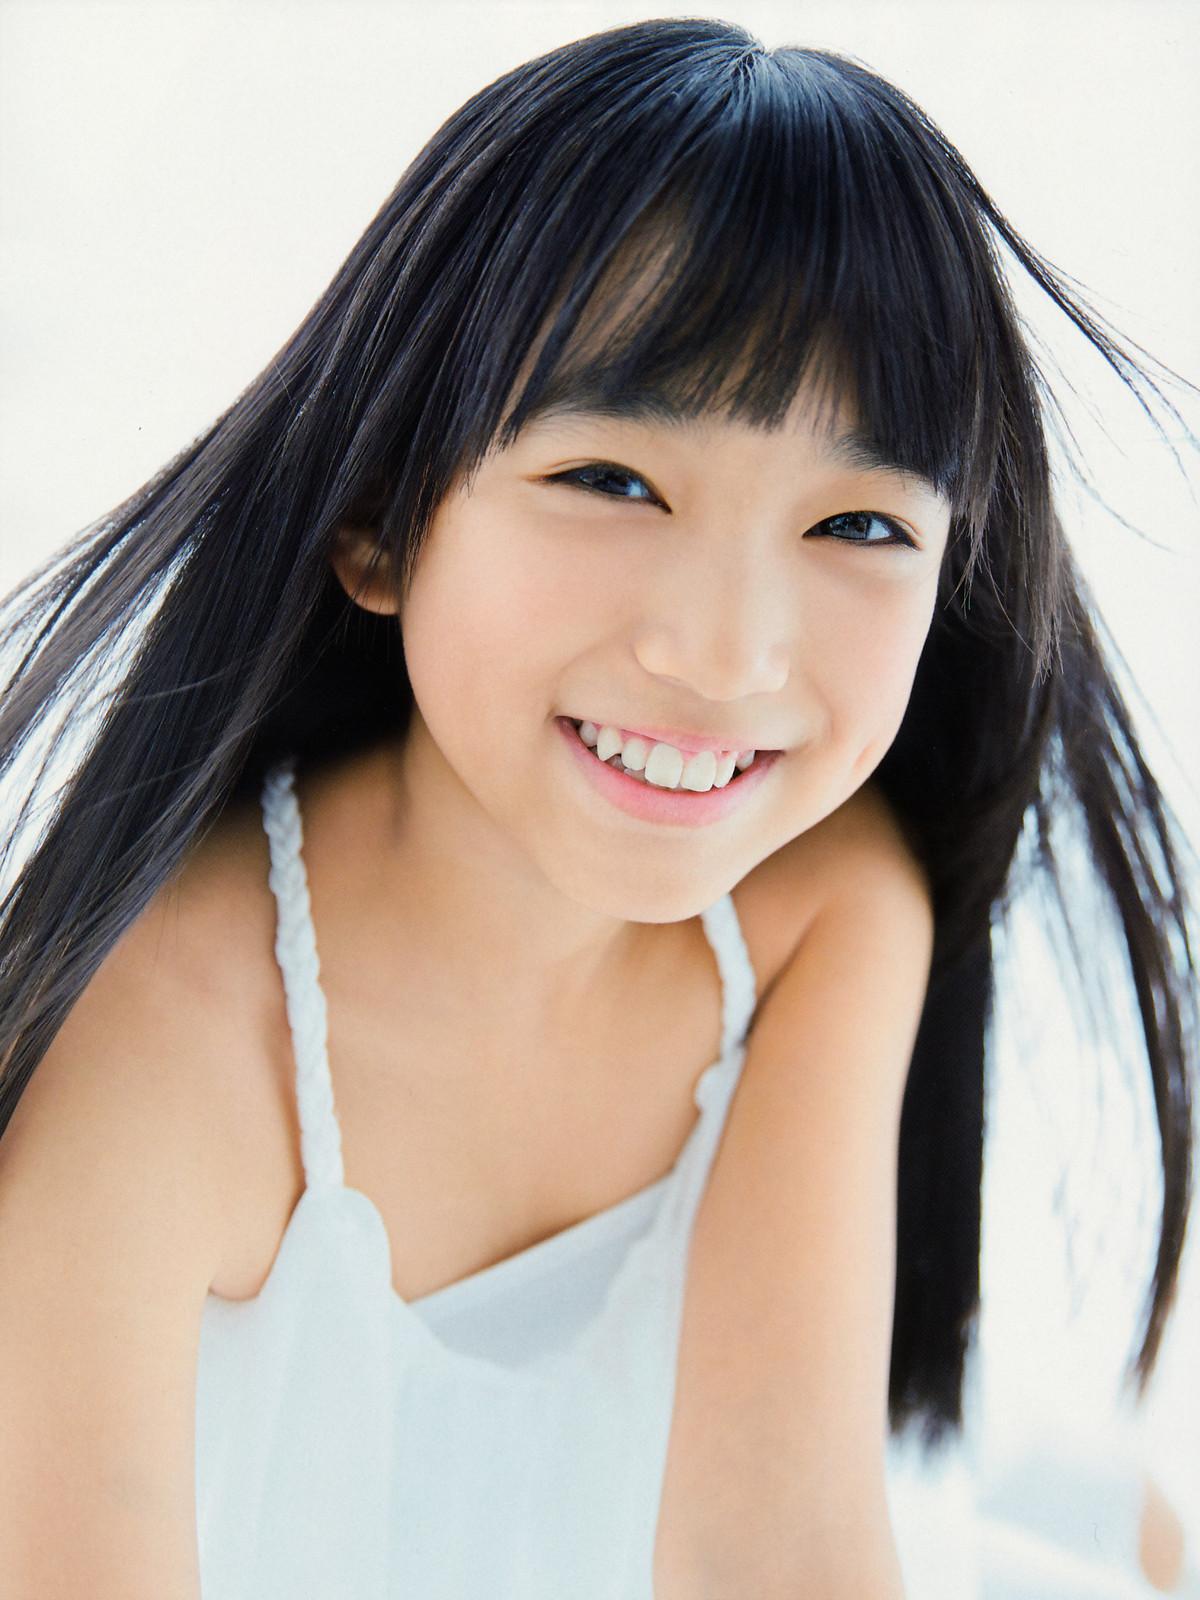 HKT48矢吹奈子(16)の胸チラ、水着グラビアエロ画像34枚・14枚目の画像